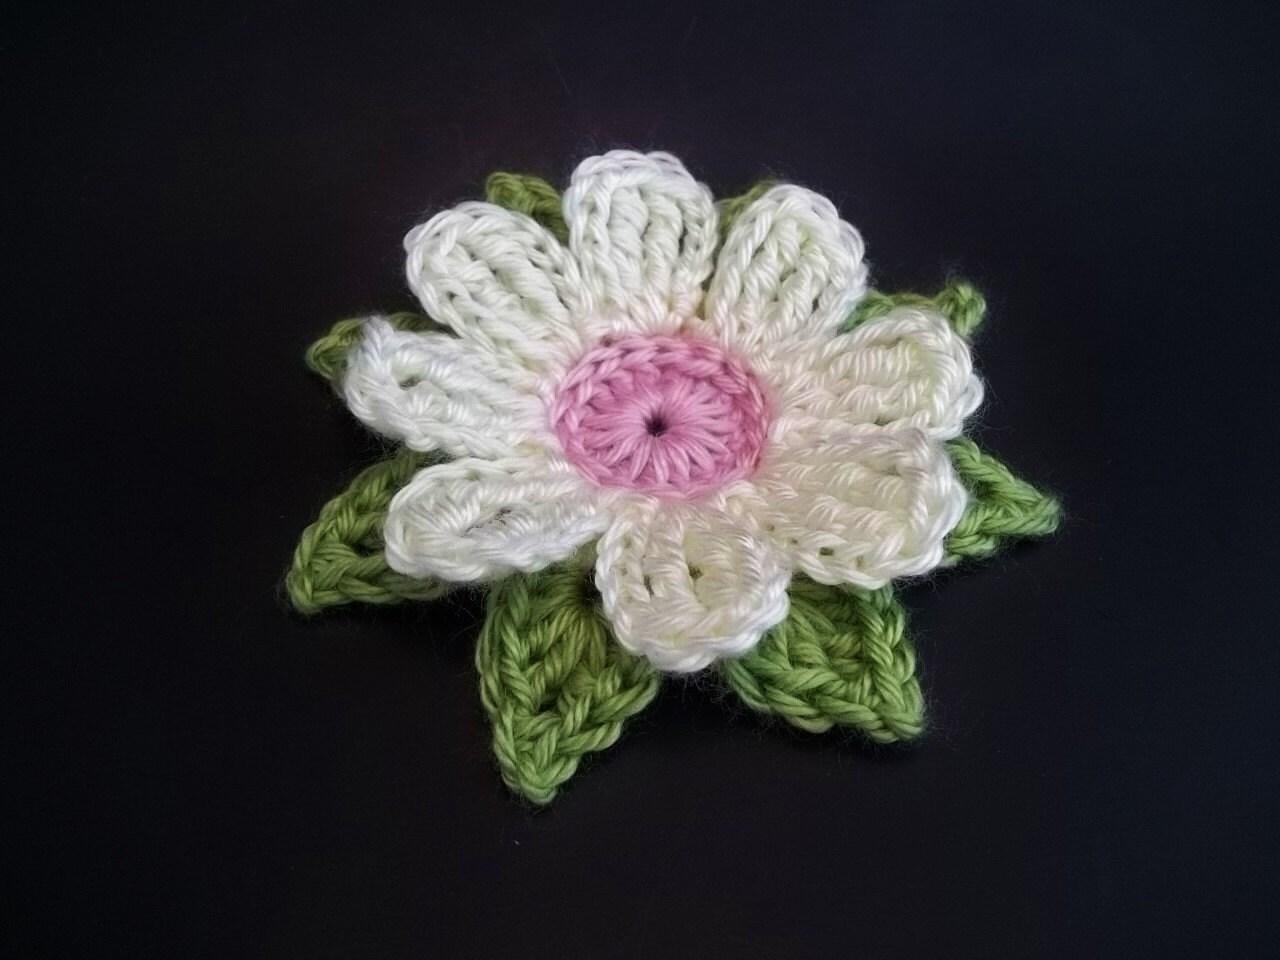 Gerbera daisy dukes flower crochet pattern zoom izmirmasajfo